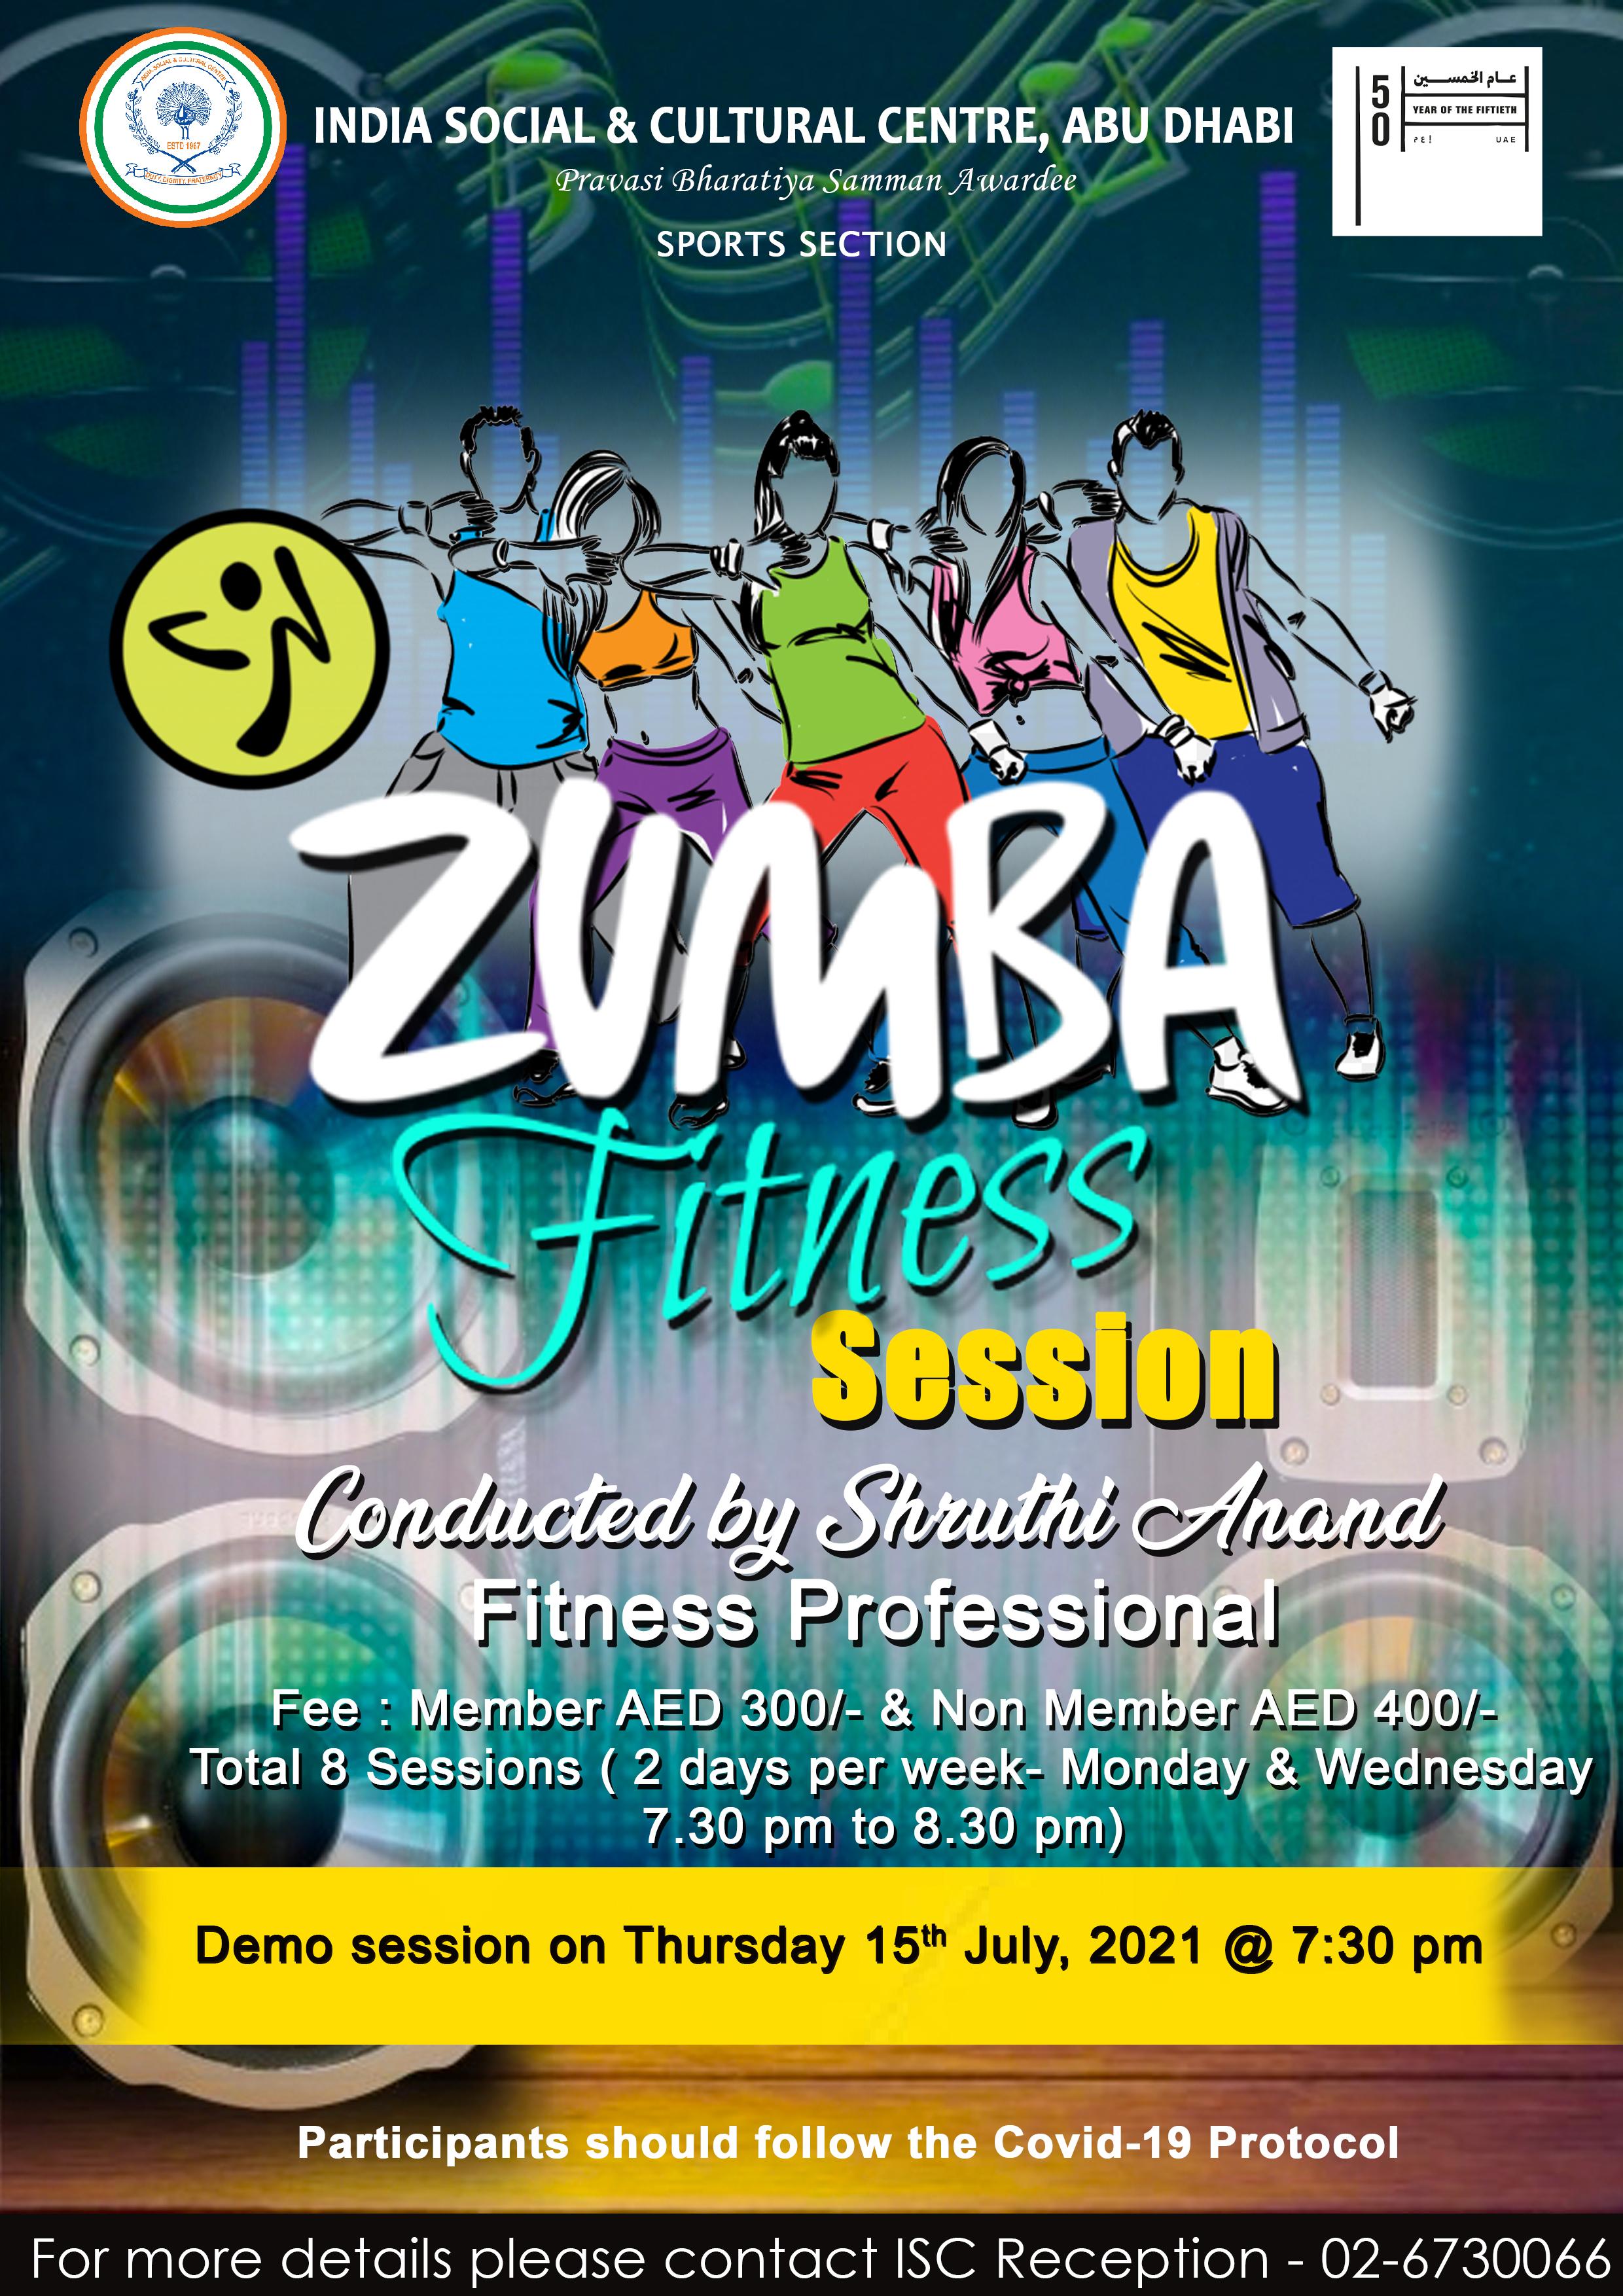 Zumba-Fitness-Session_1626364893